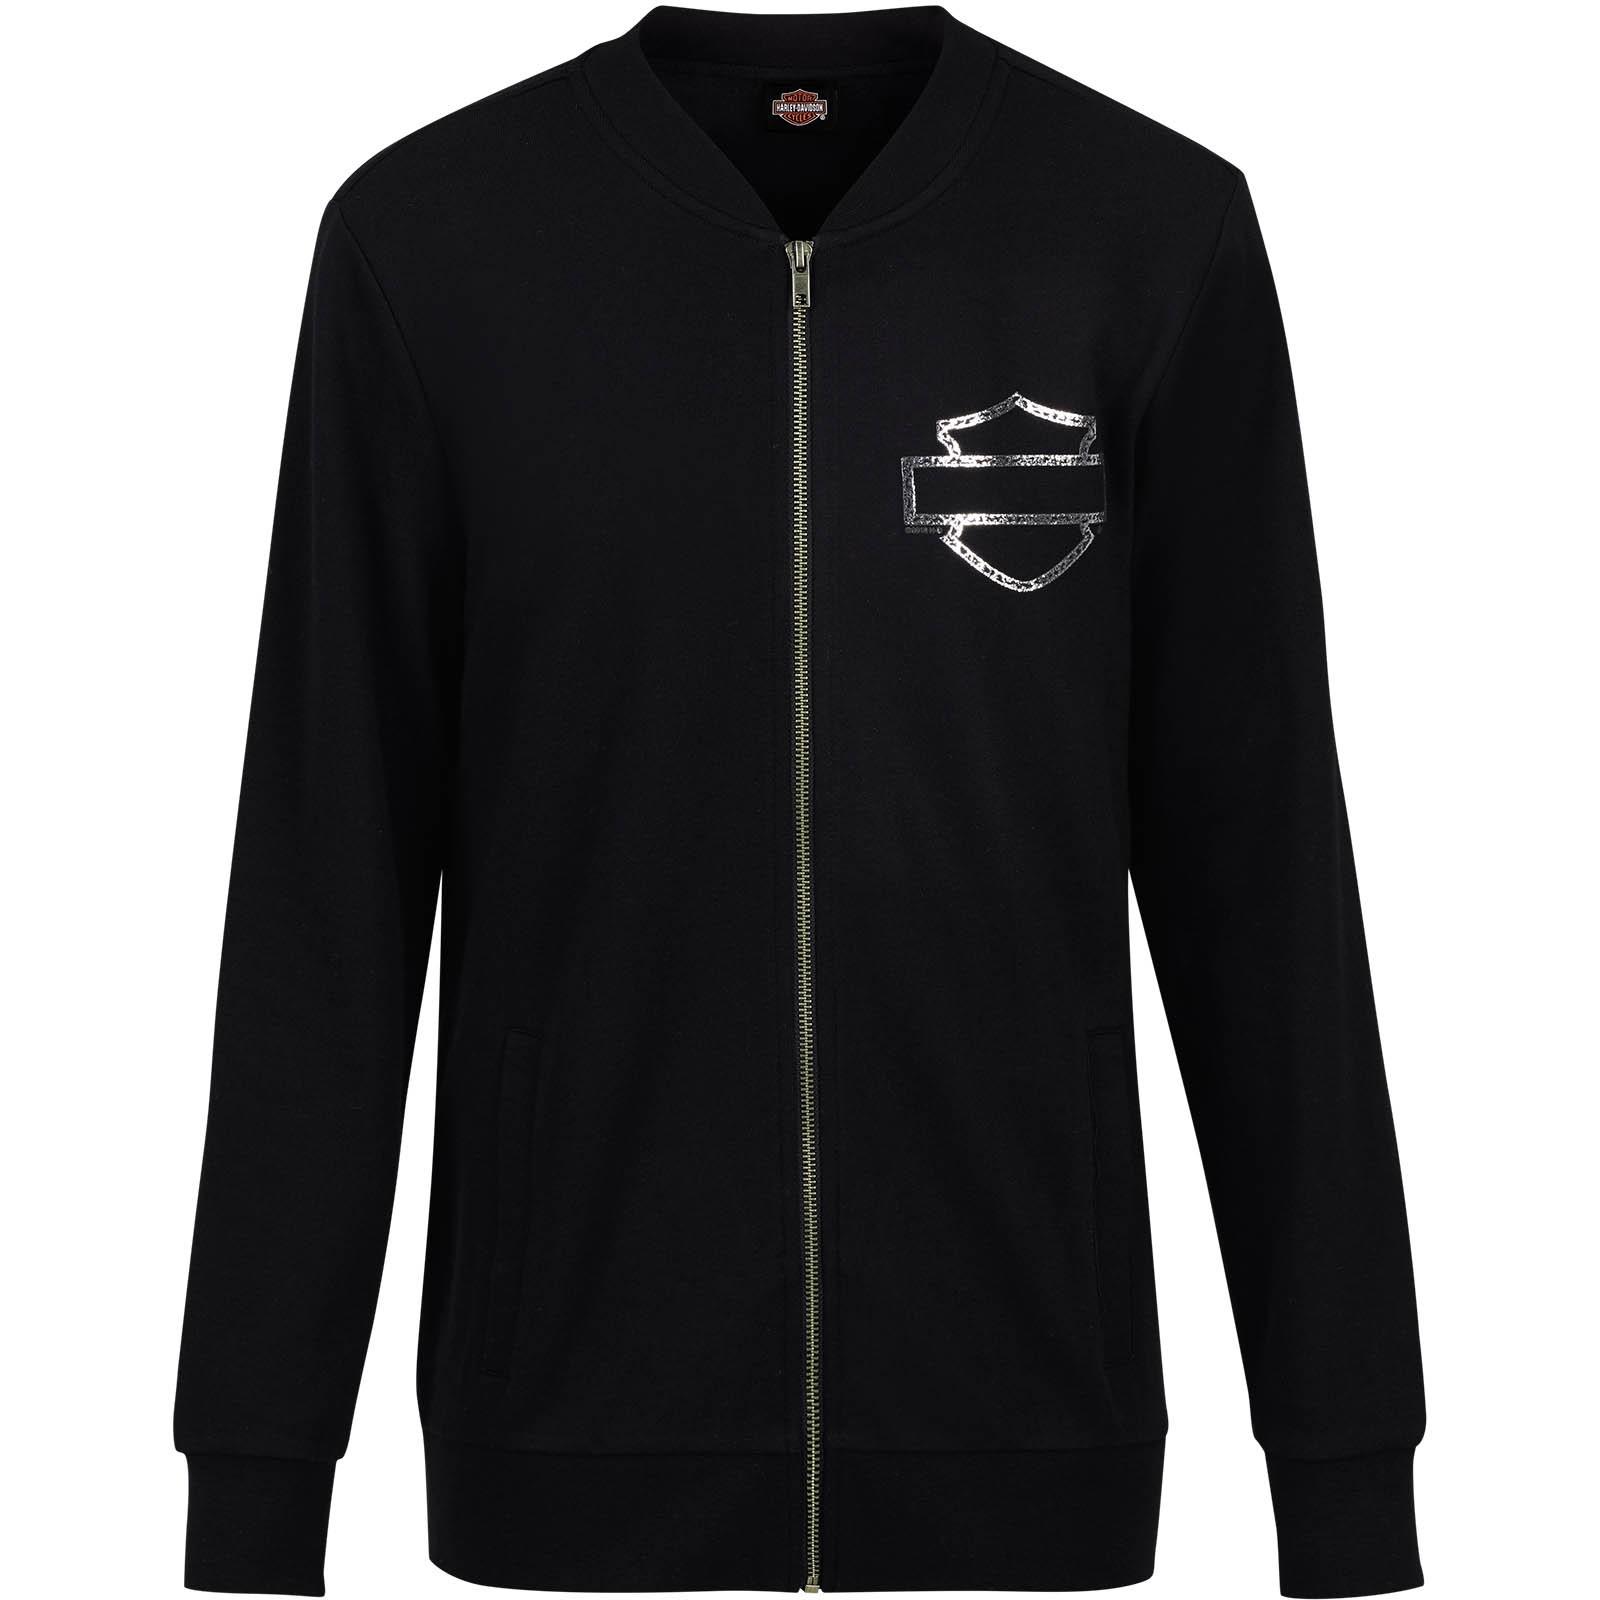 Harley-Davidson Women's French Terry Bomber Jacket - Overseas Tour   Iconic Logo